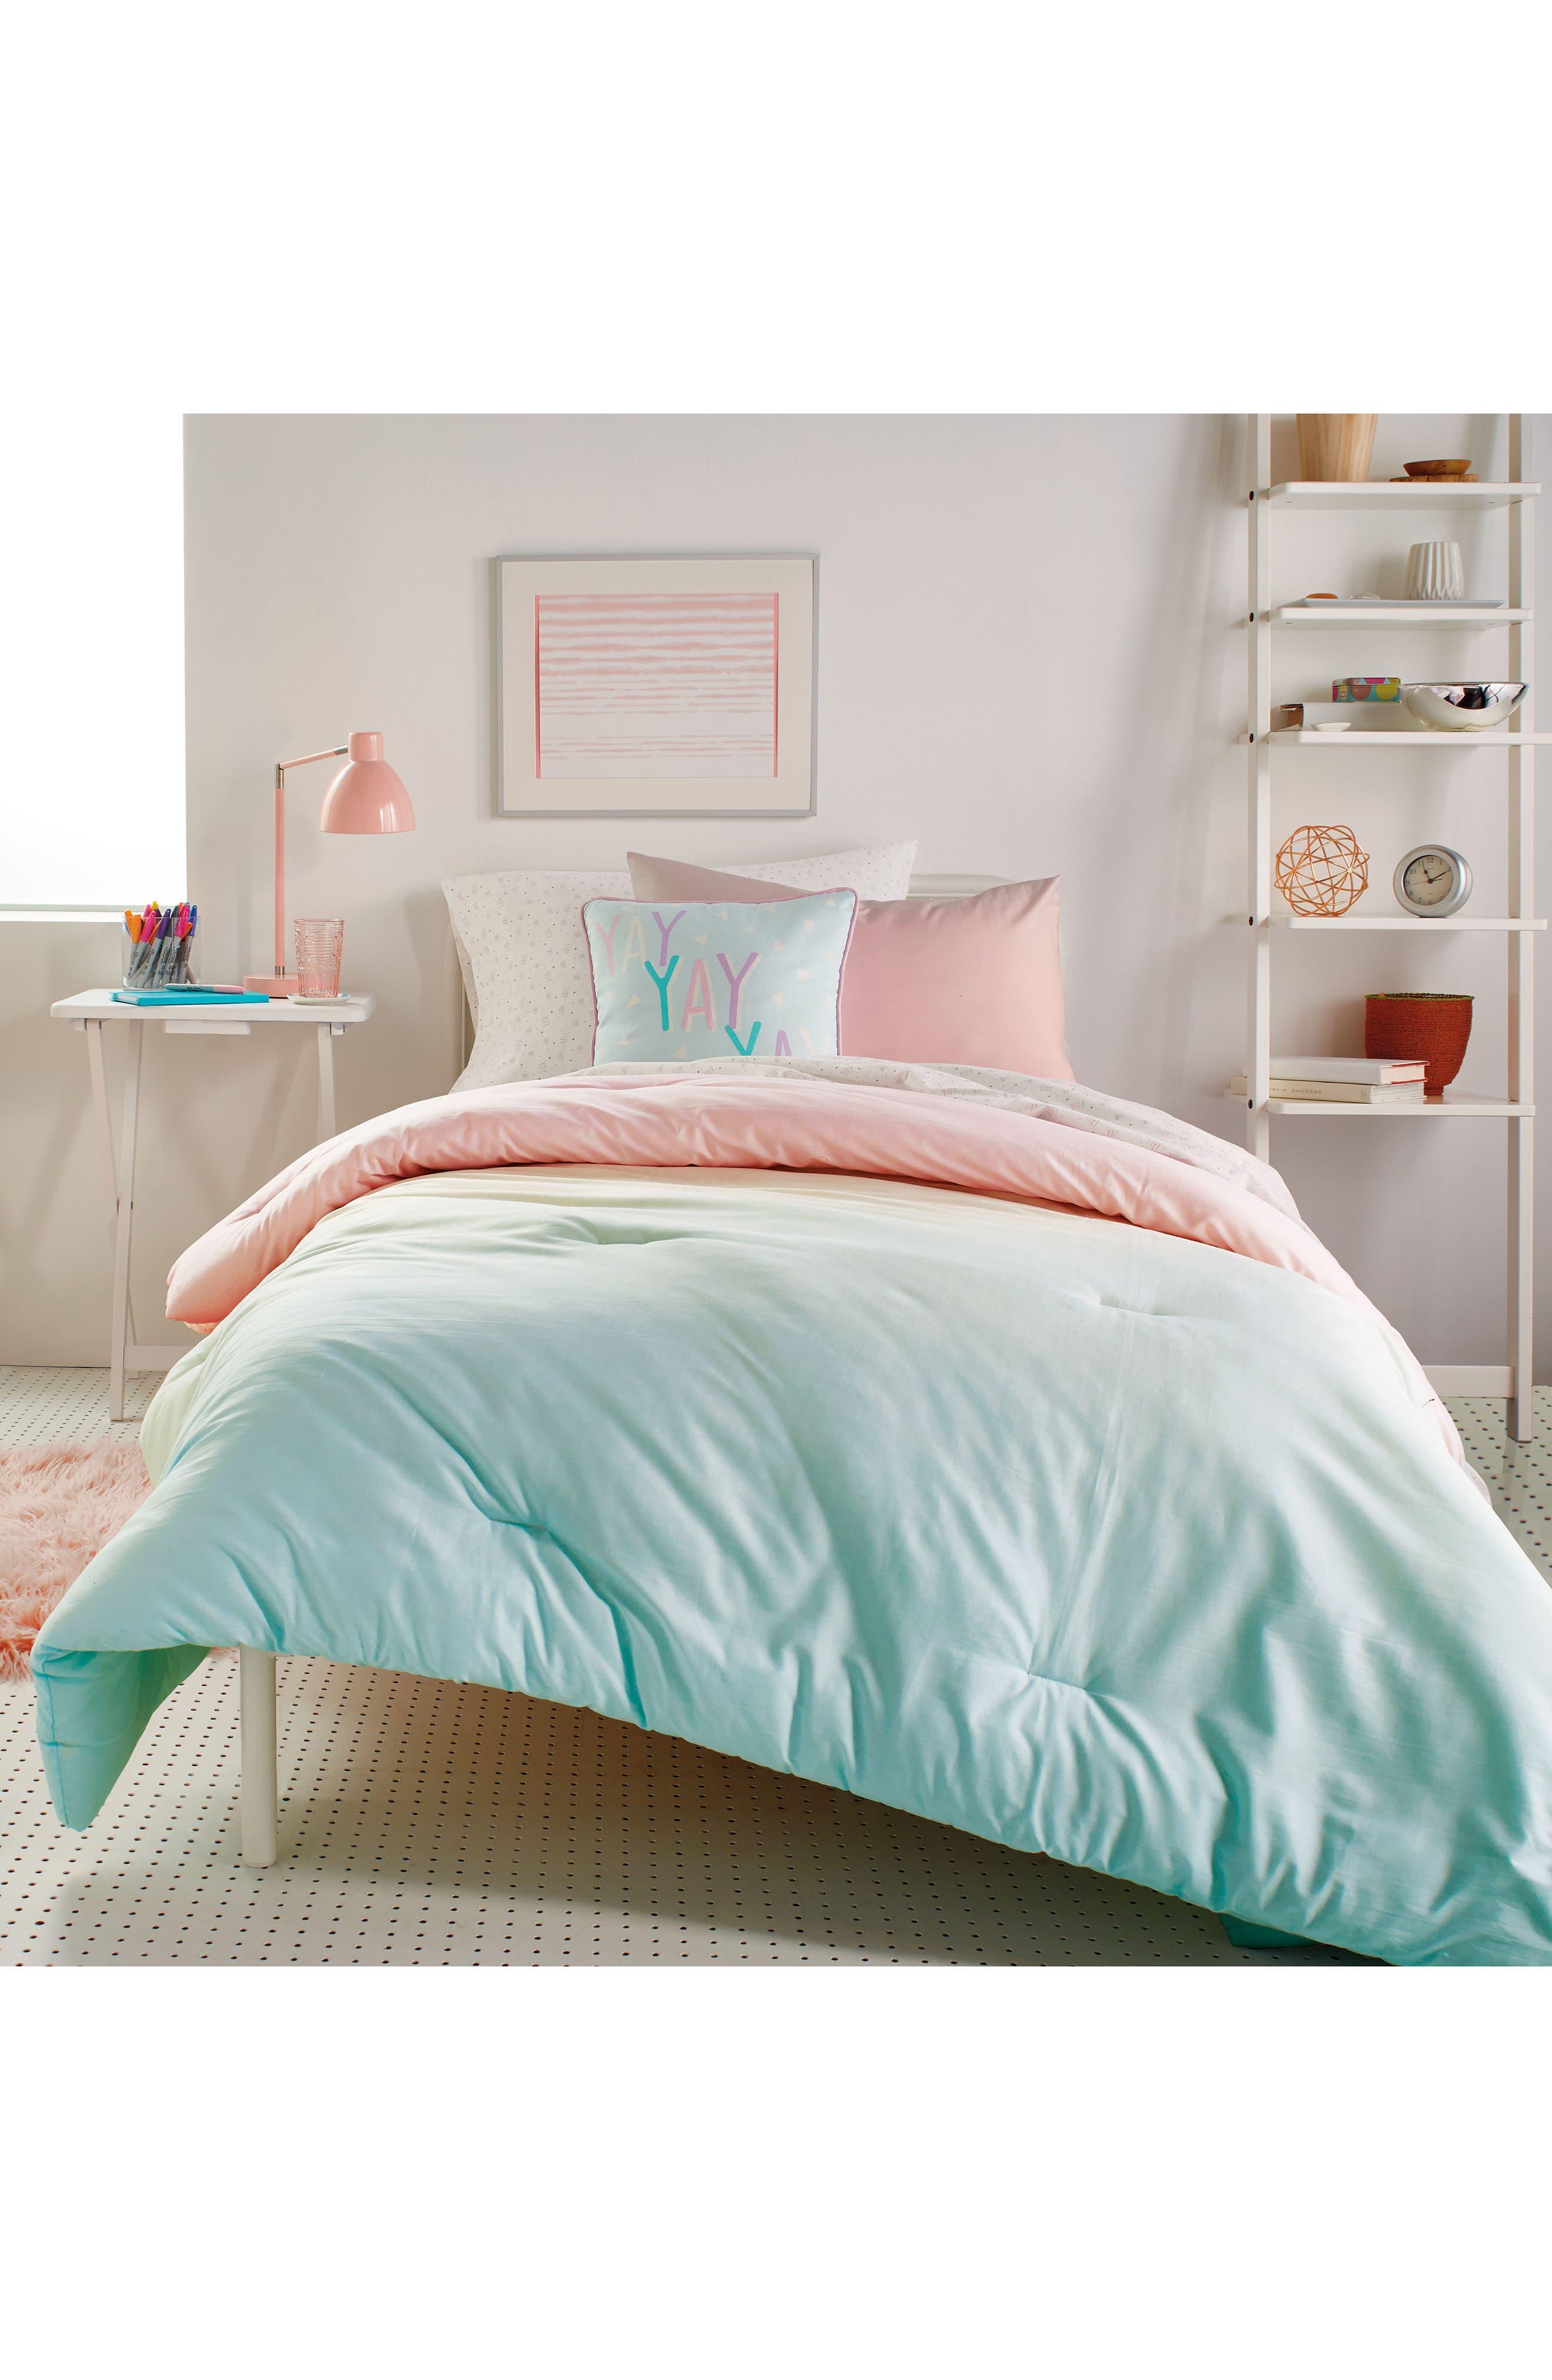 DKNY Empire Light Comforter, Sham & Accent Pillow Set, Main, color, 675